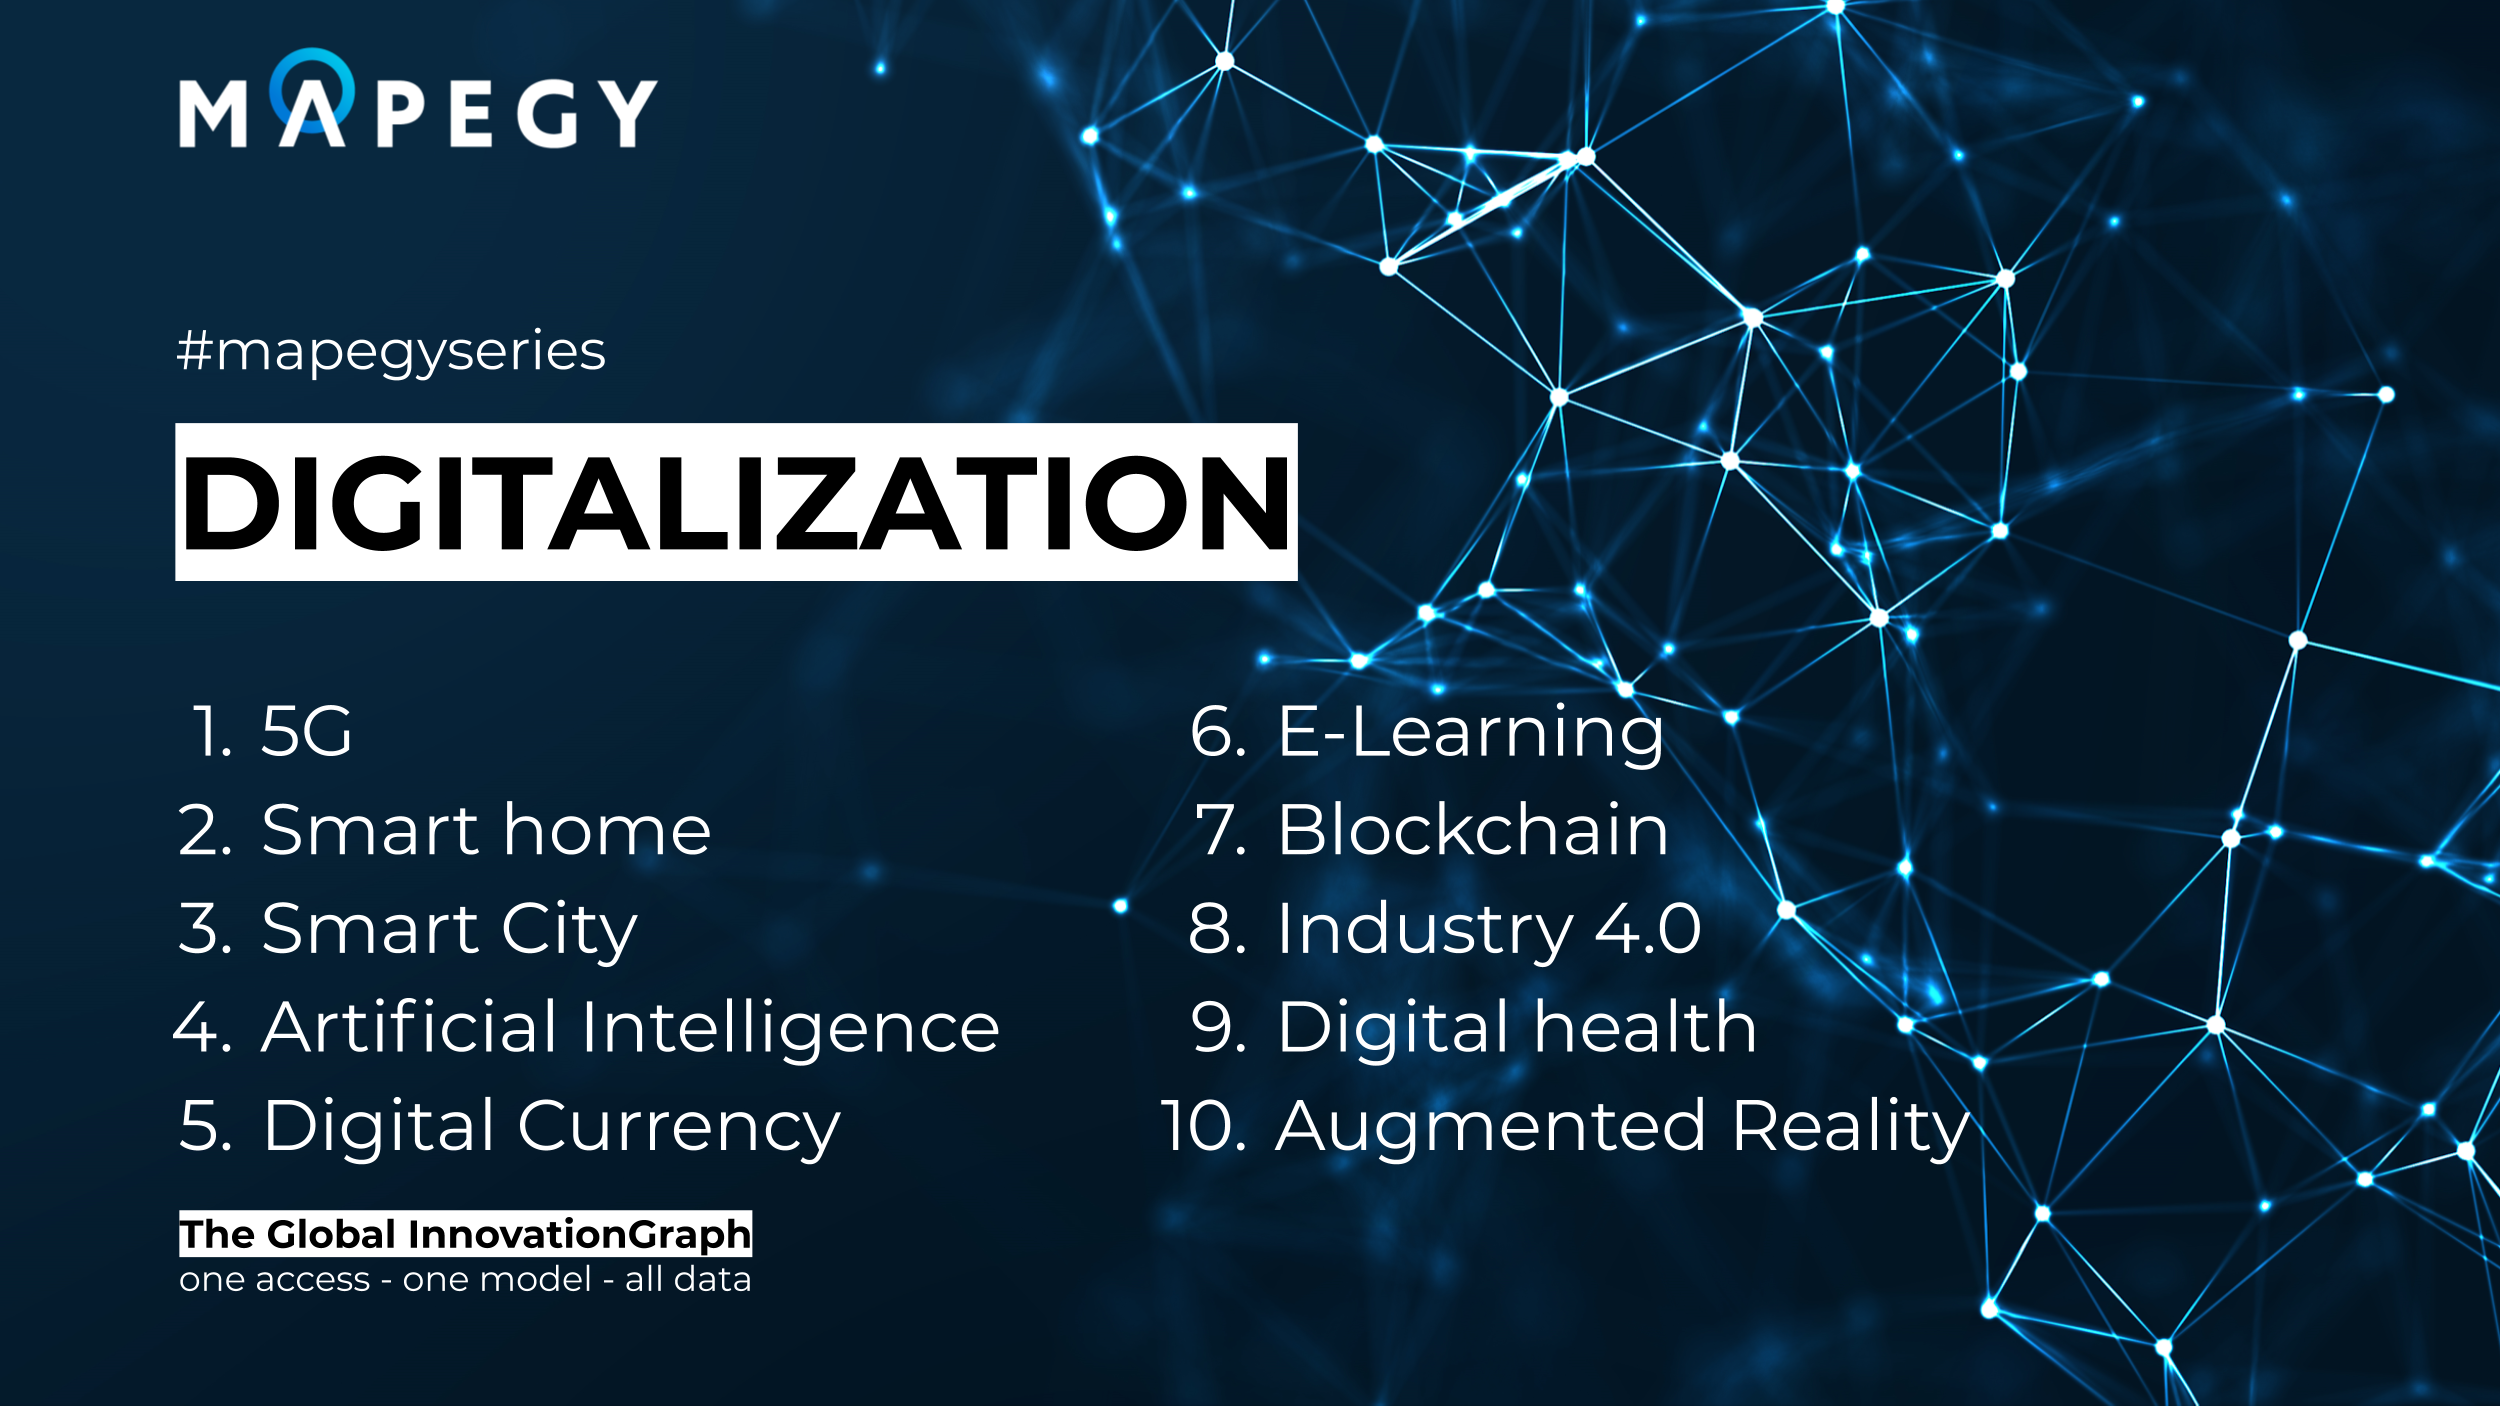 Top 10 digital transformation trends